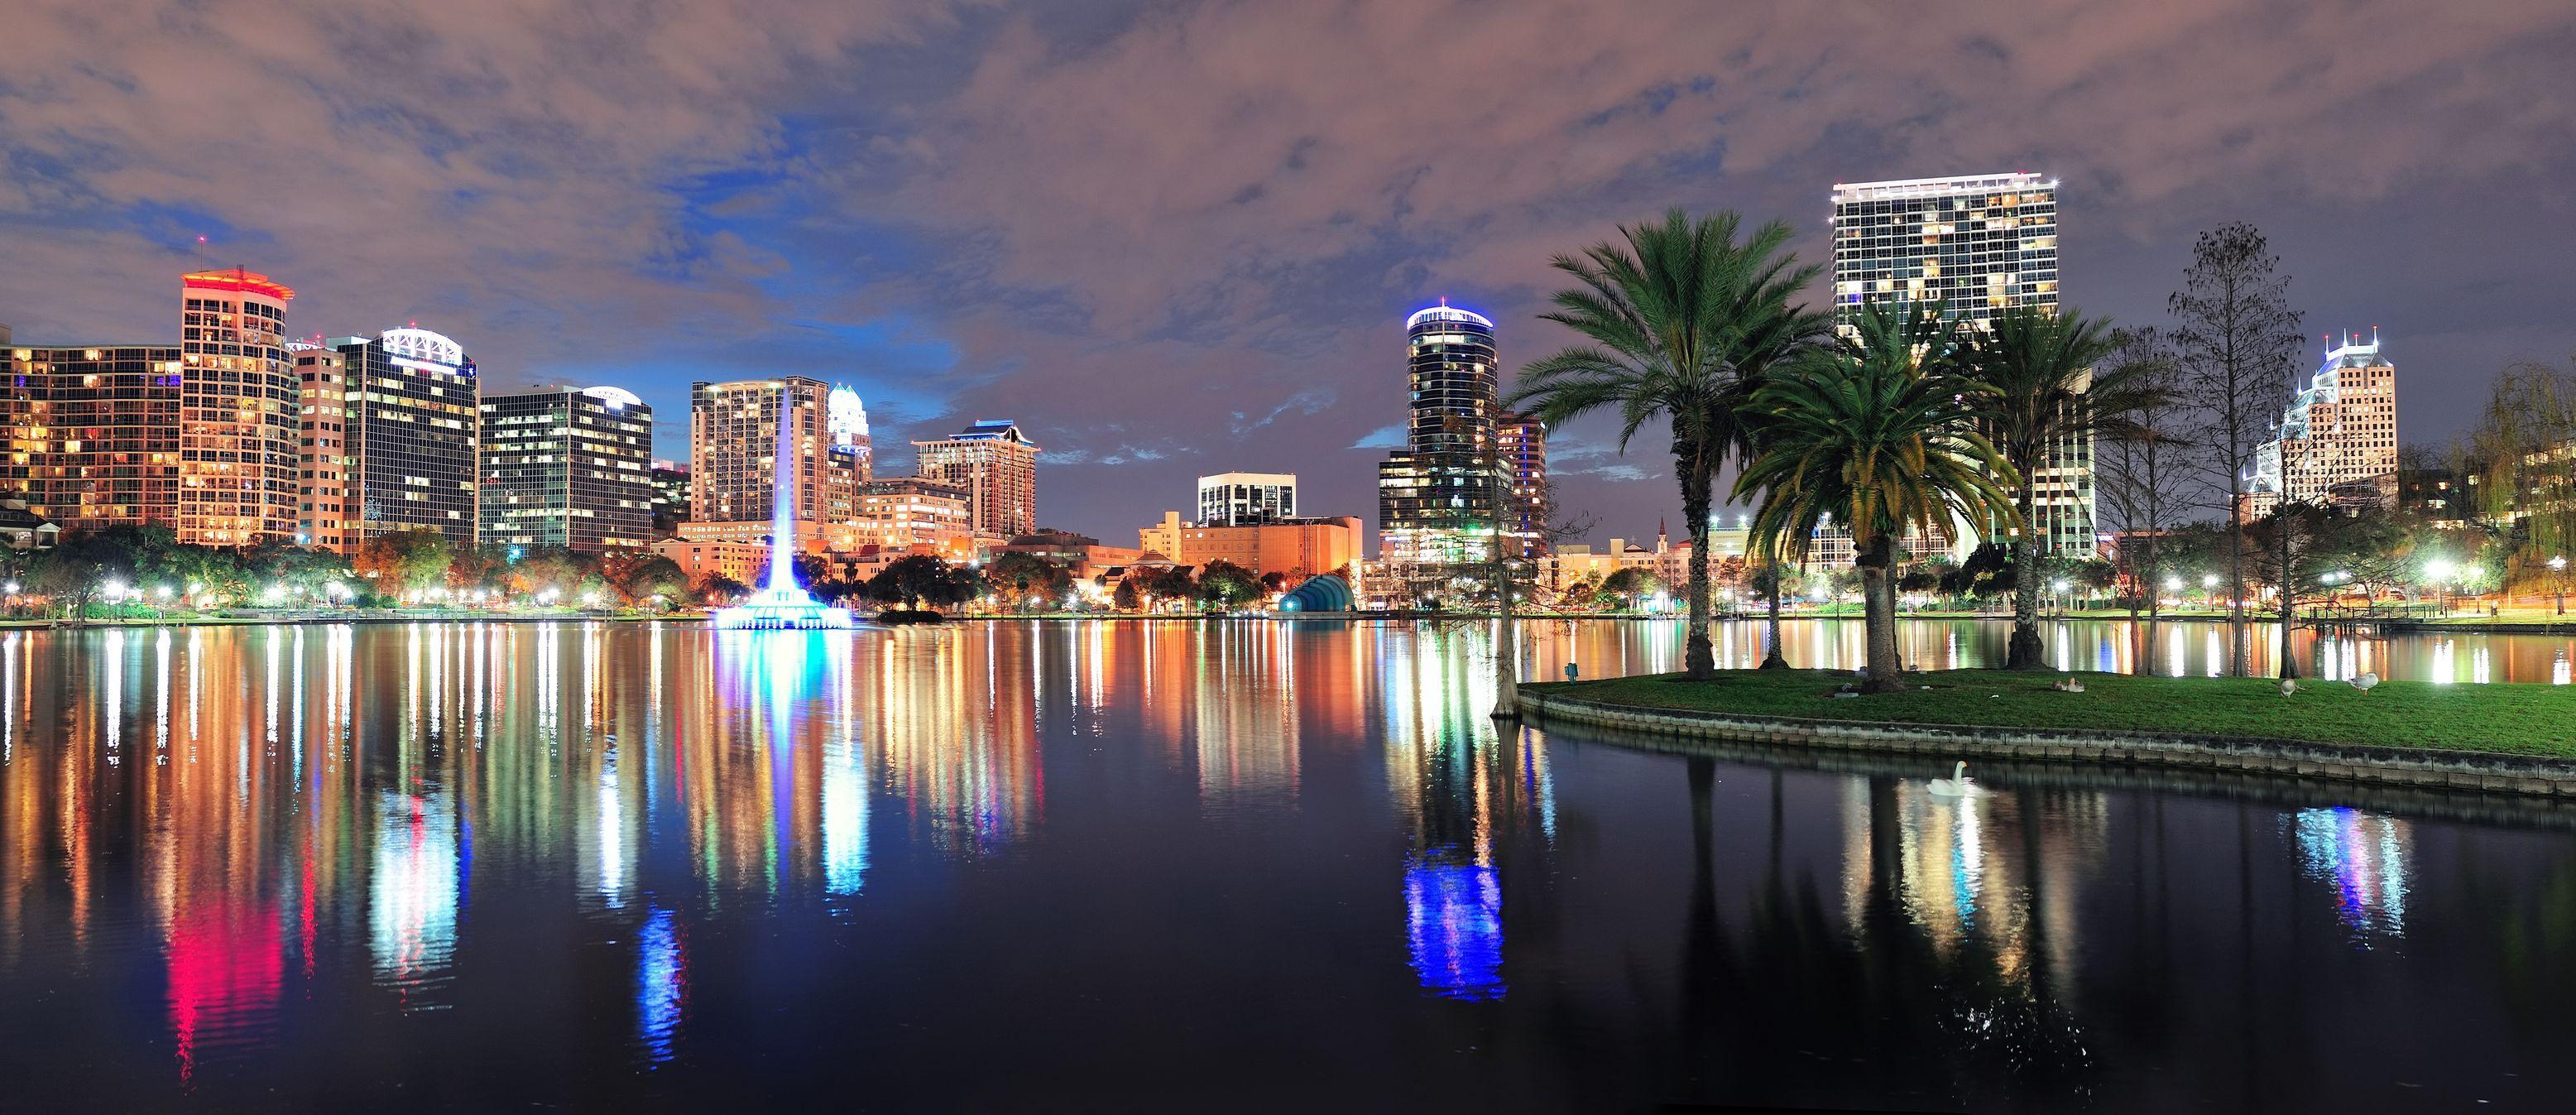 Pin On Orlando Florida